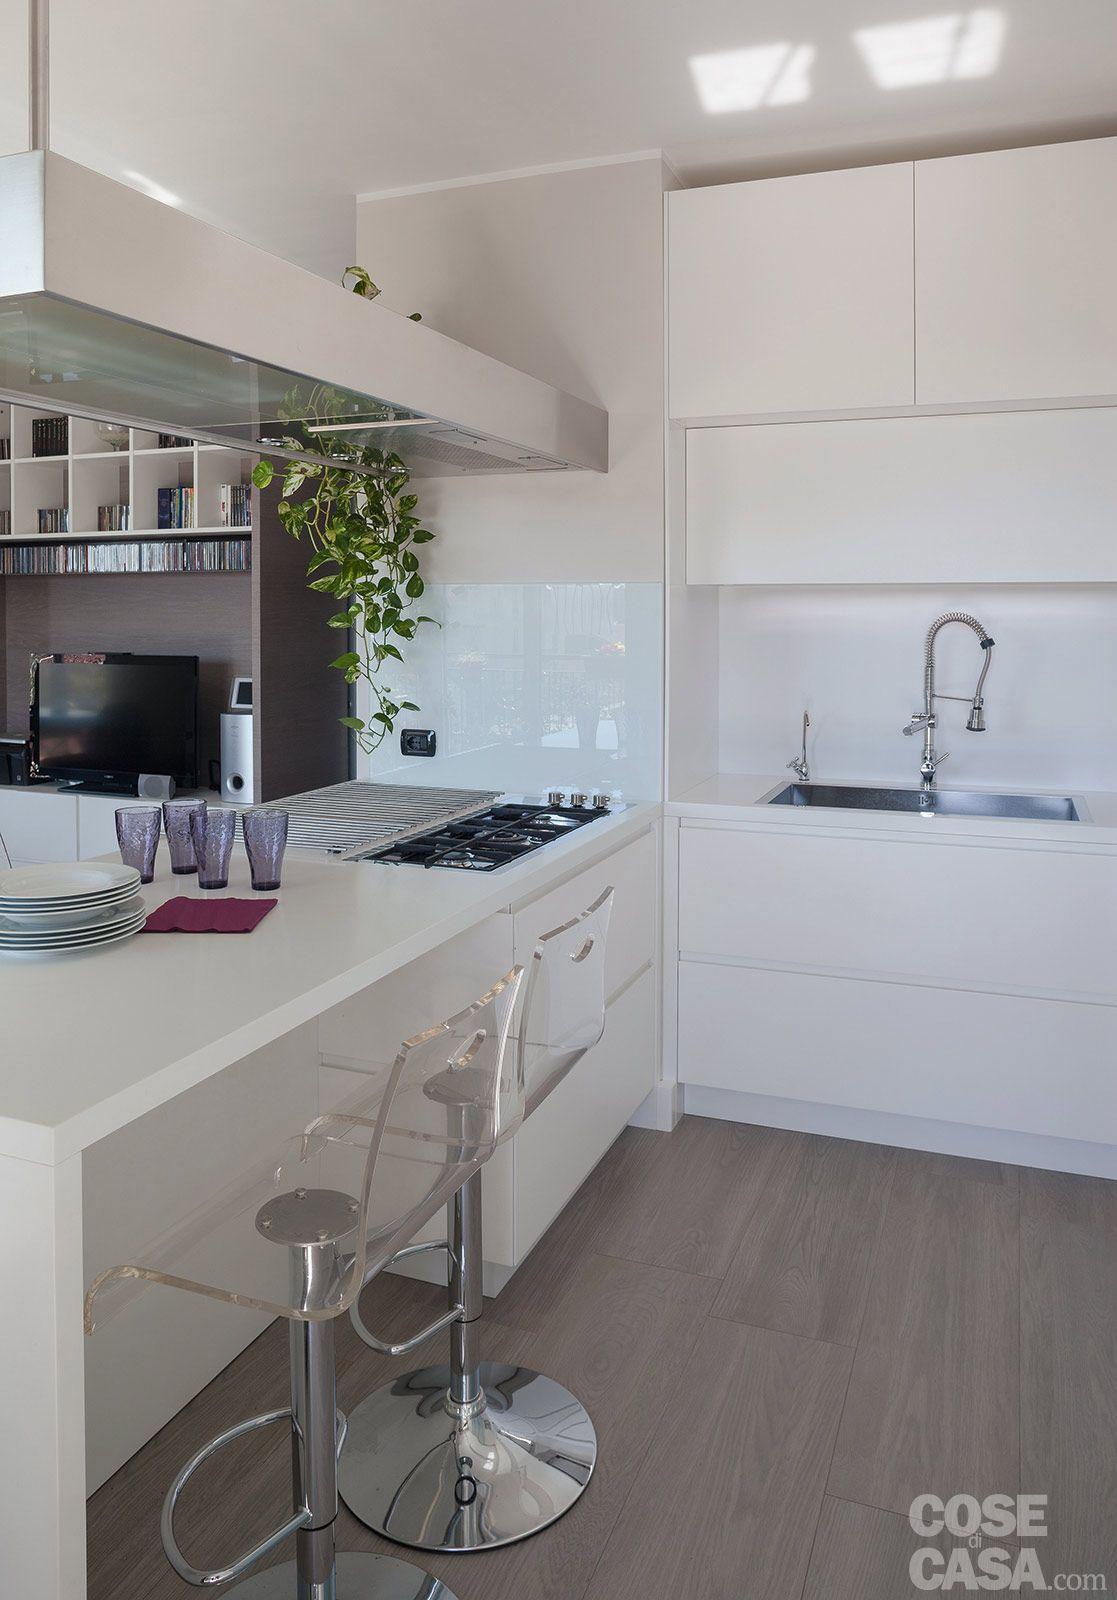 Pensili cucina da parete : pensili cucina cartongesso. pensili ...